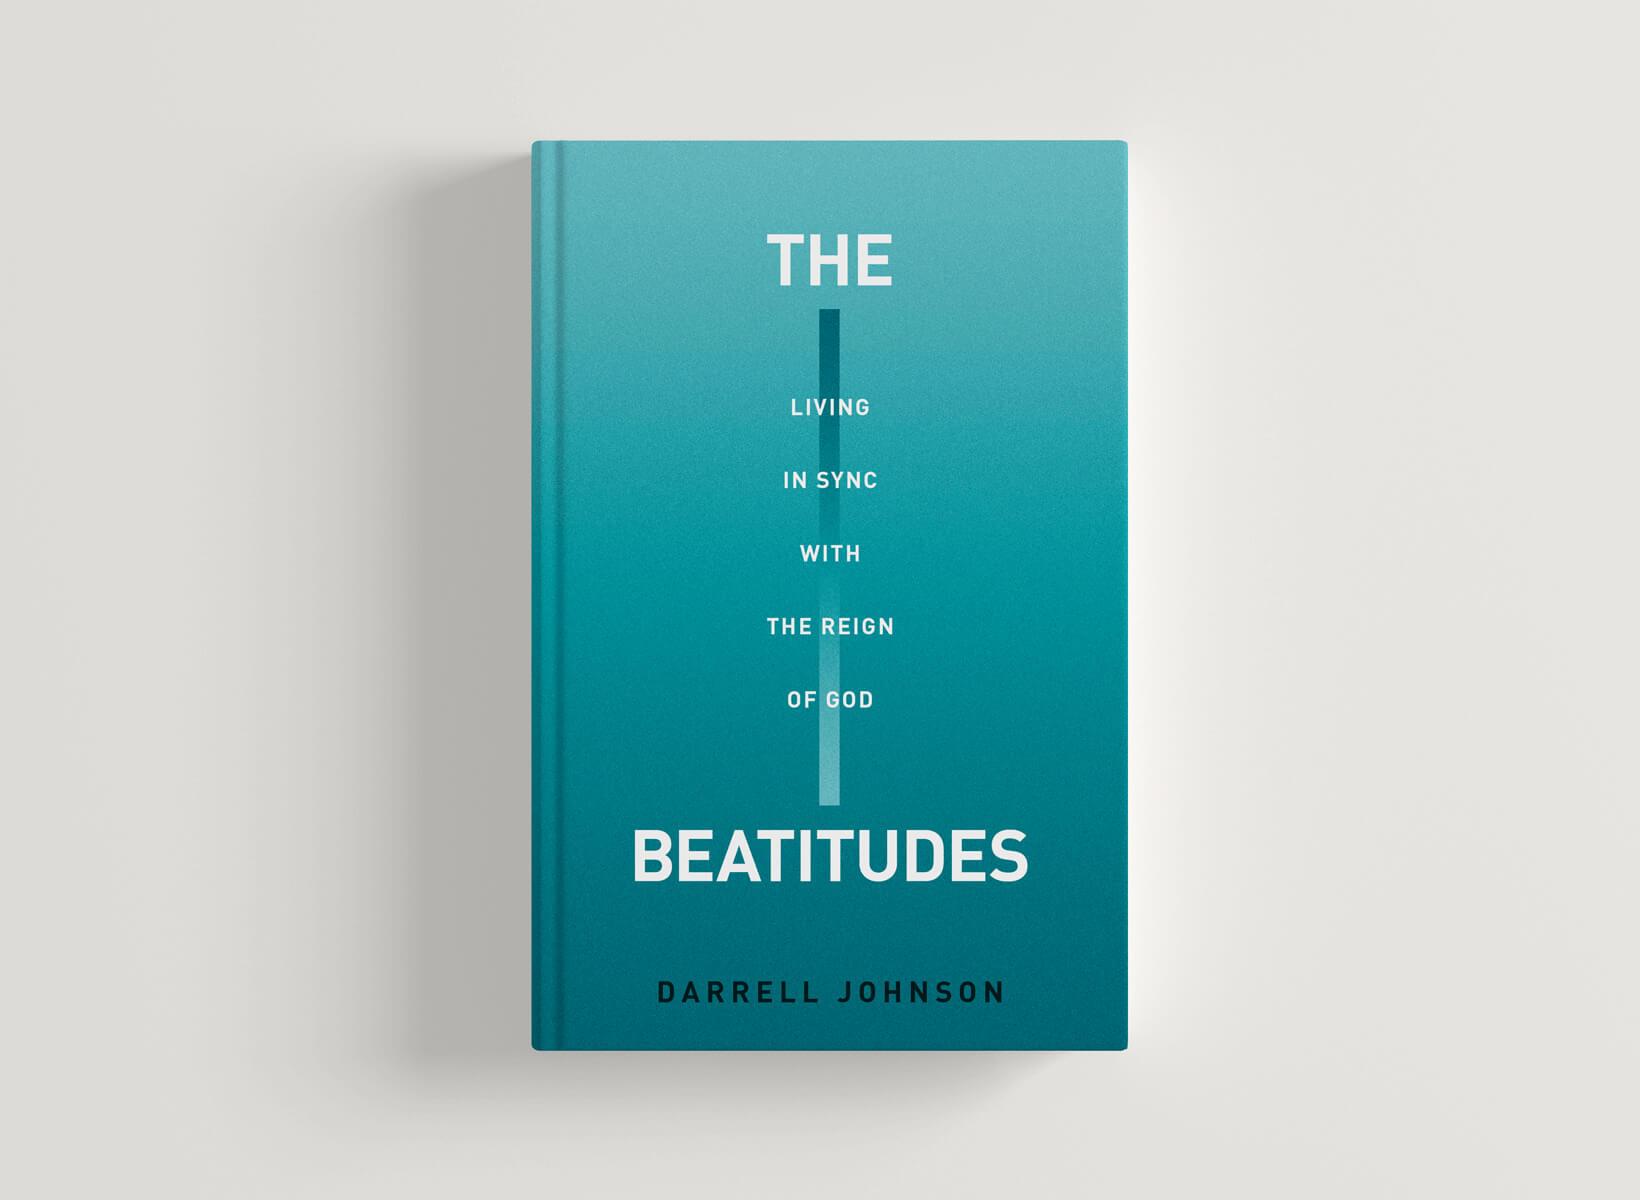 The Beatitudes Darrell Johnson